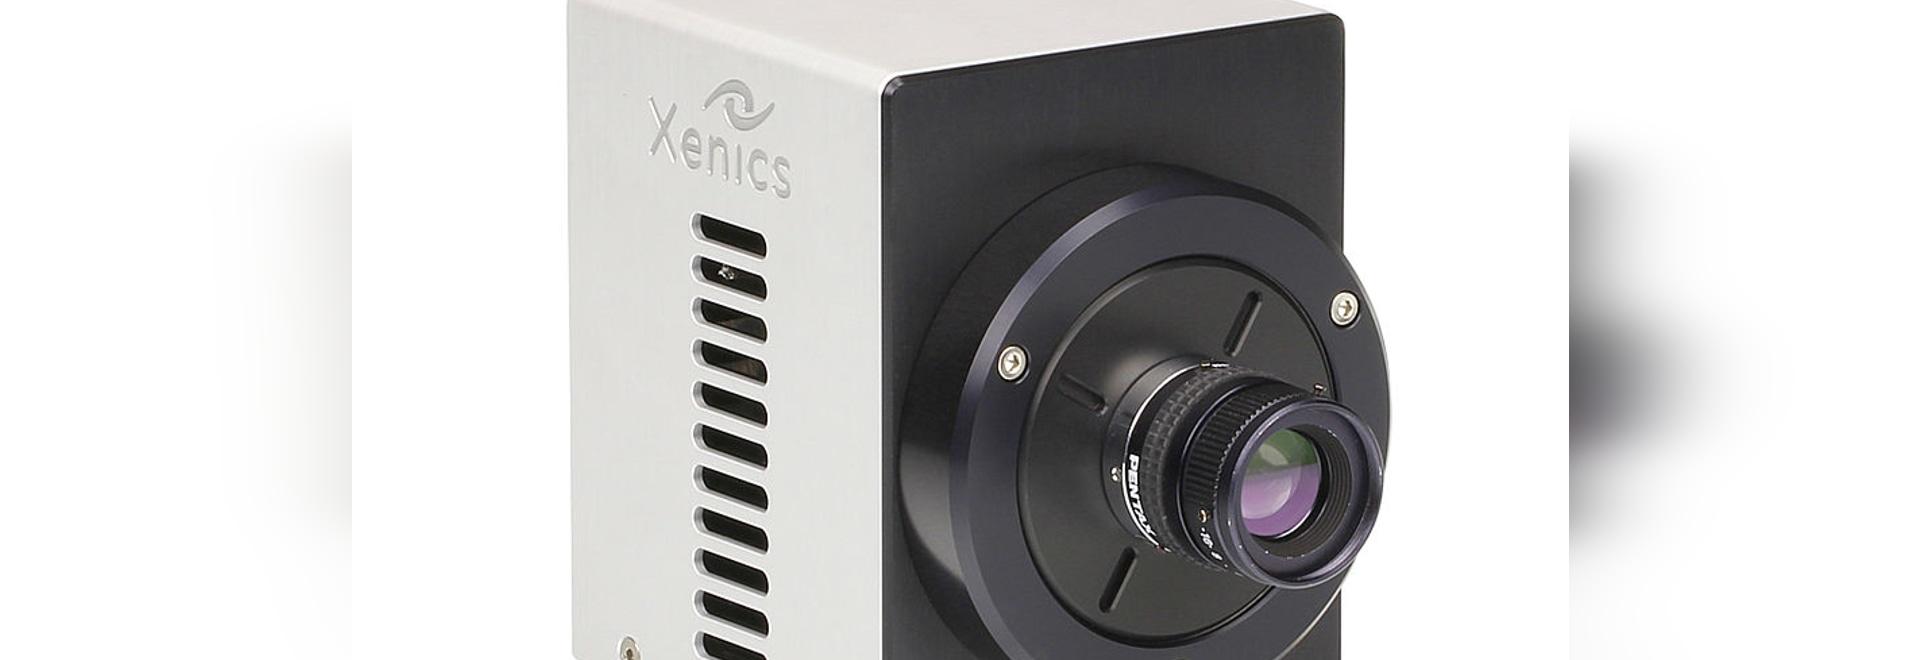 New product SPIE Photonics West - Xenics Versatile SWIR T2SL Camera up to 2.35 μm